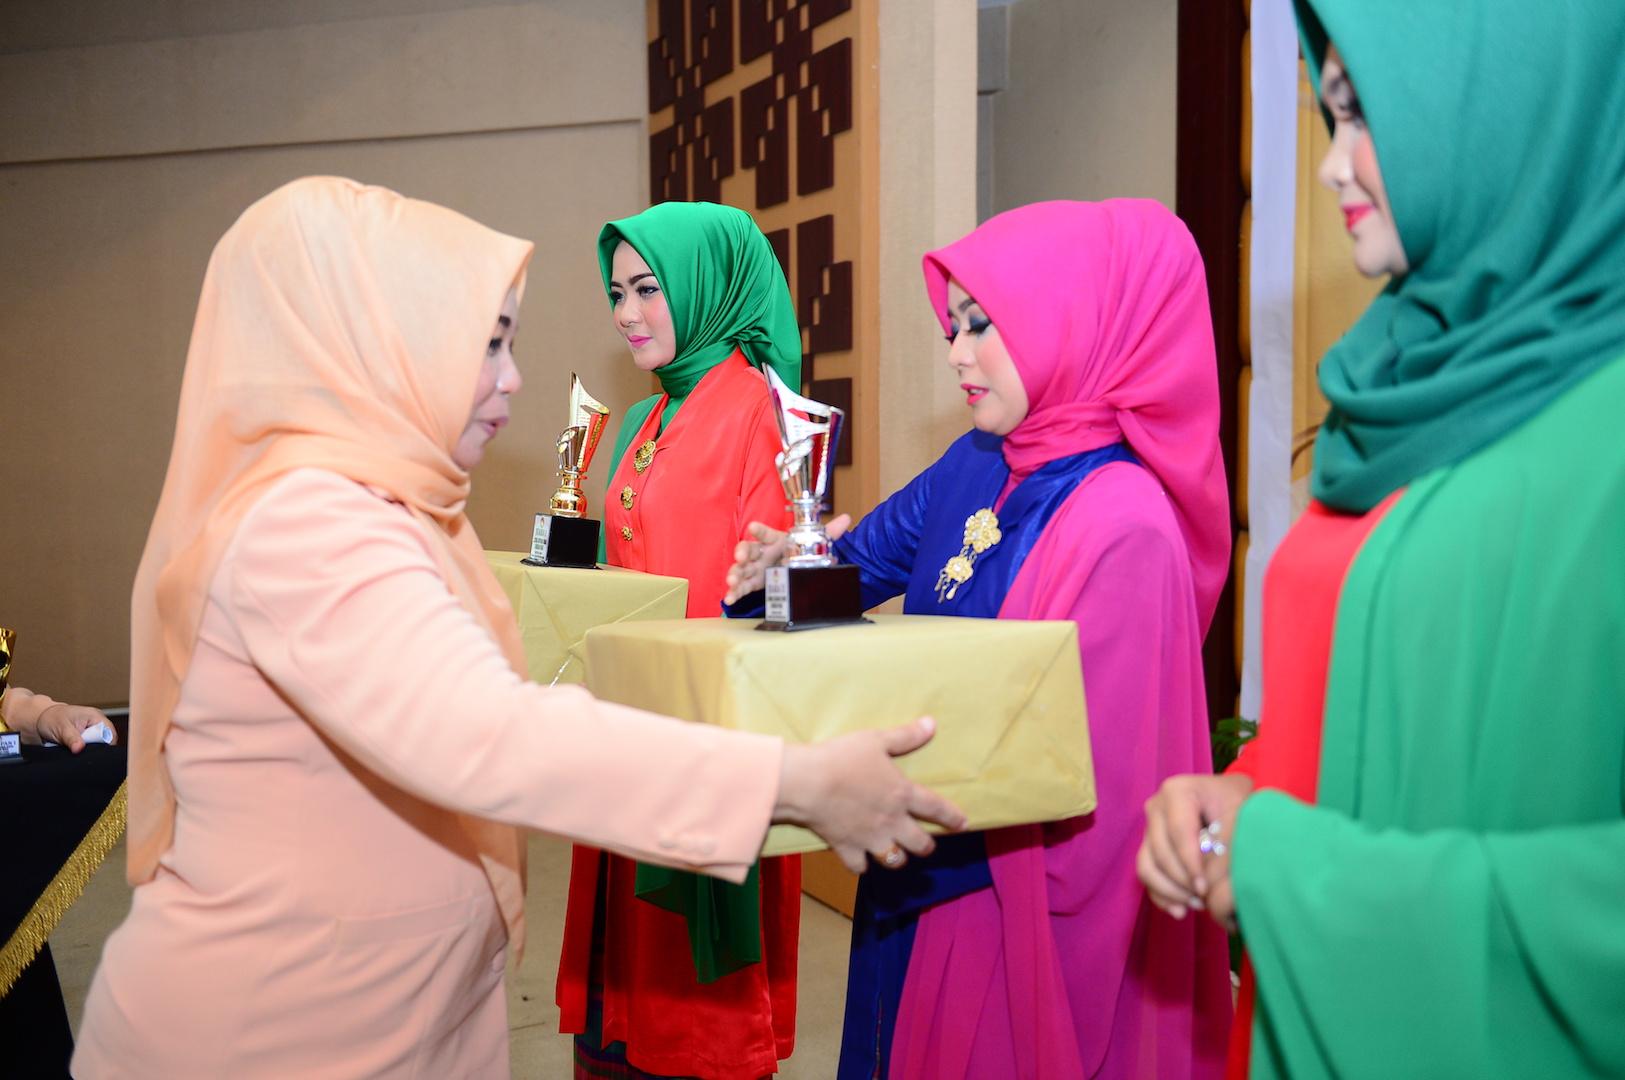 Ketua DWP Prov Riau Hj Rabaina serahkan Trophy Lomba HUT DWP ke 17 Prov Riau